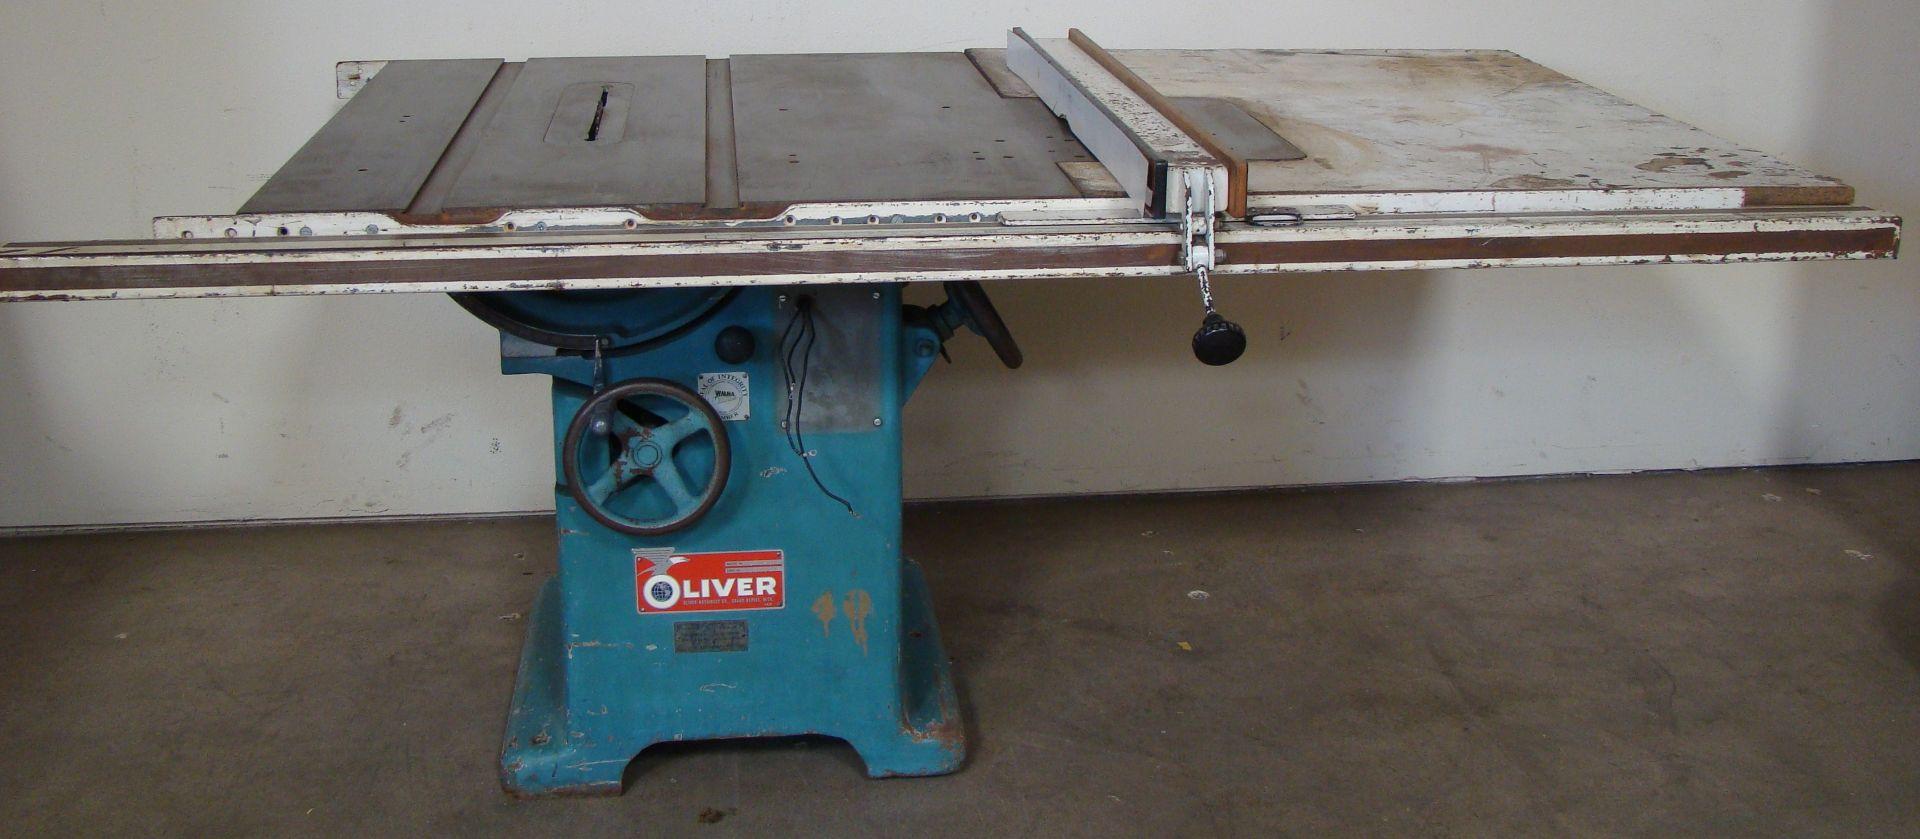 "Lot 4 - Oliver Table Saw 270-D 50"" Biesemeyer Rails & Fence 5 HP 220/440 Volt 3PH"